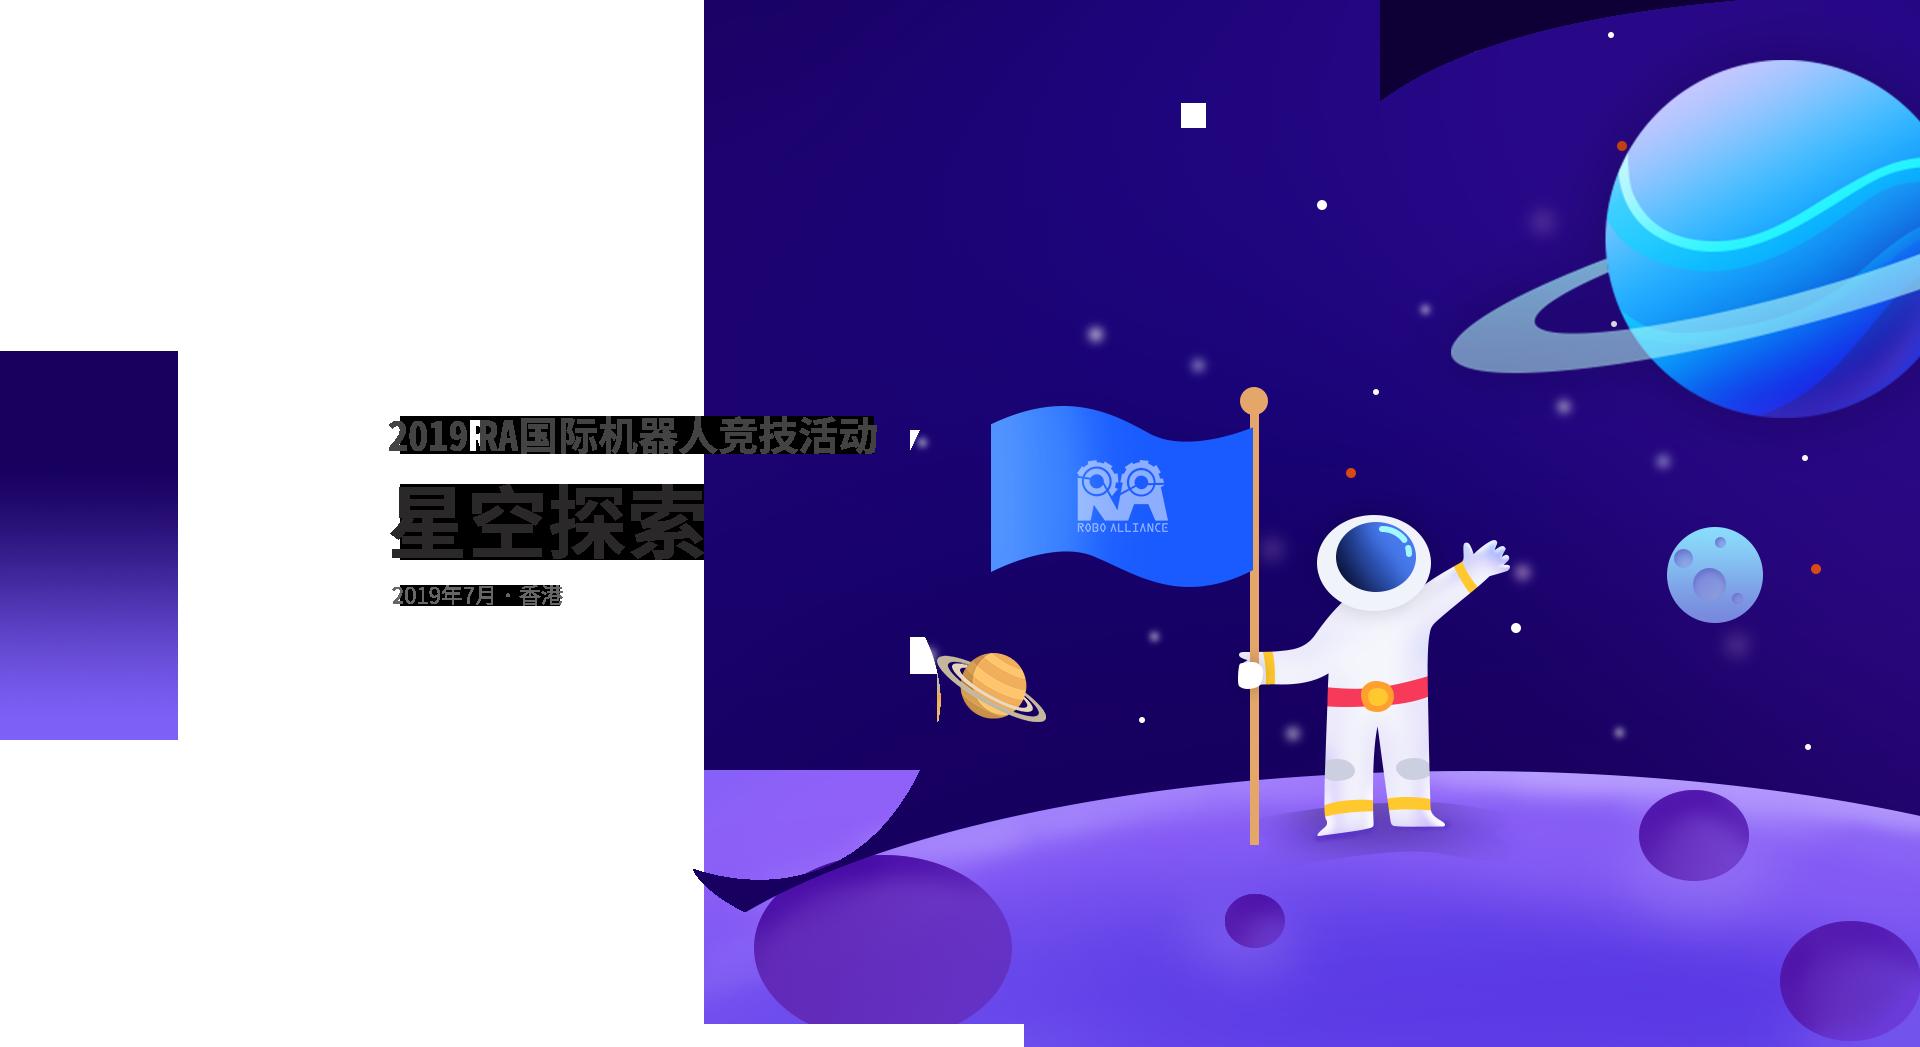 2019 RA国际机器人竞技活动(香港站)